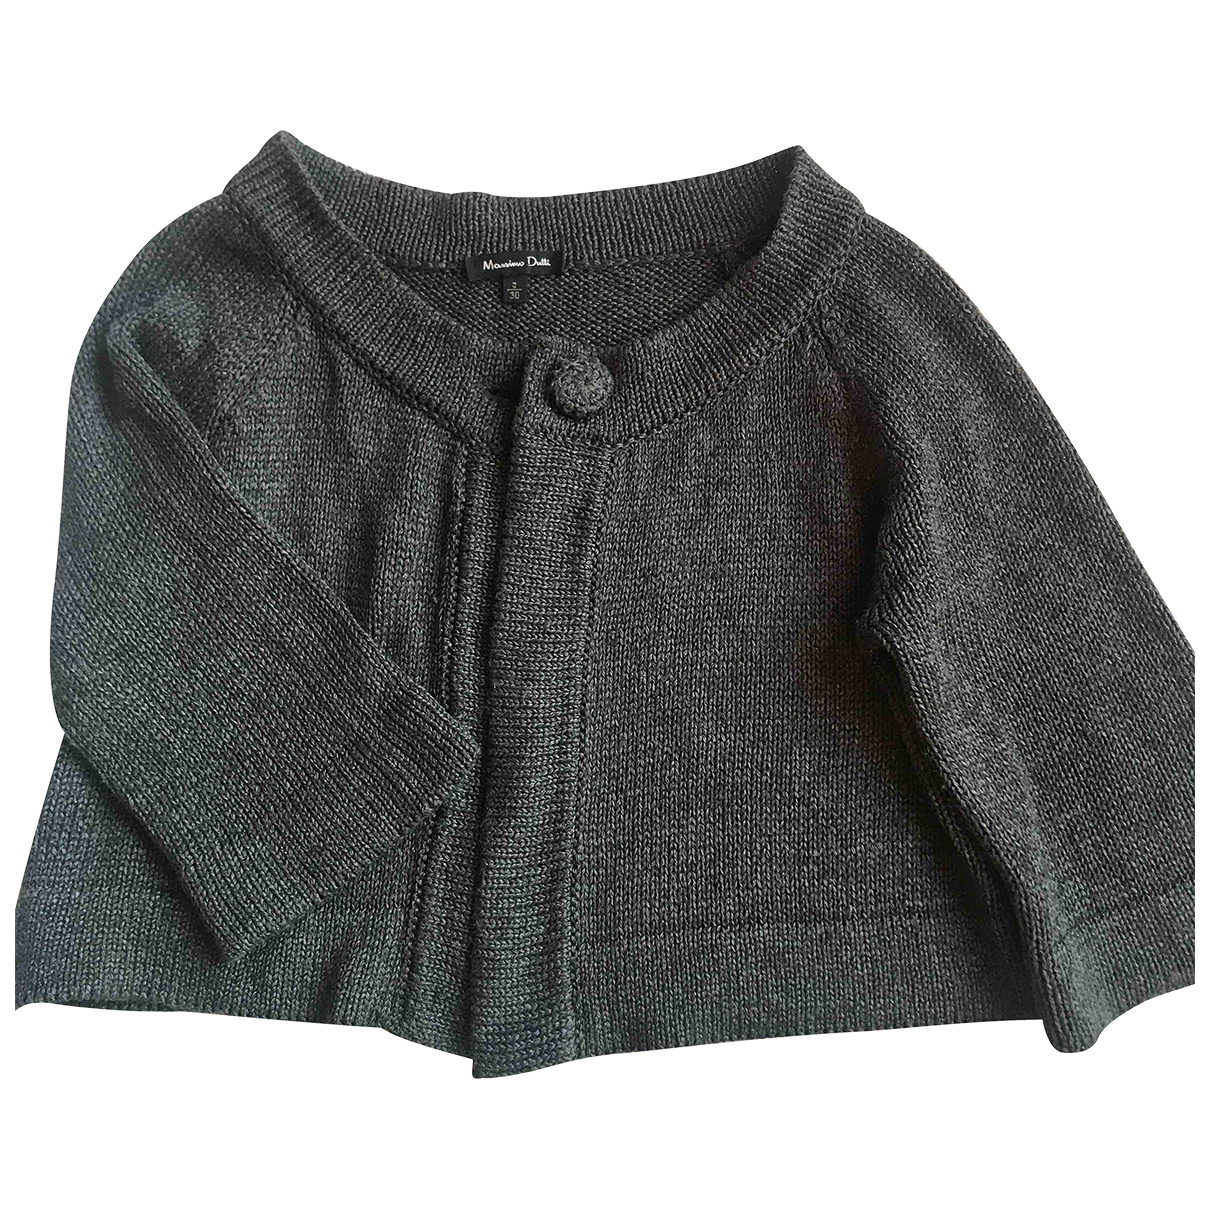 Massimo Dutti N Grey Knitwear for Women S International